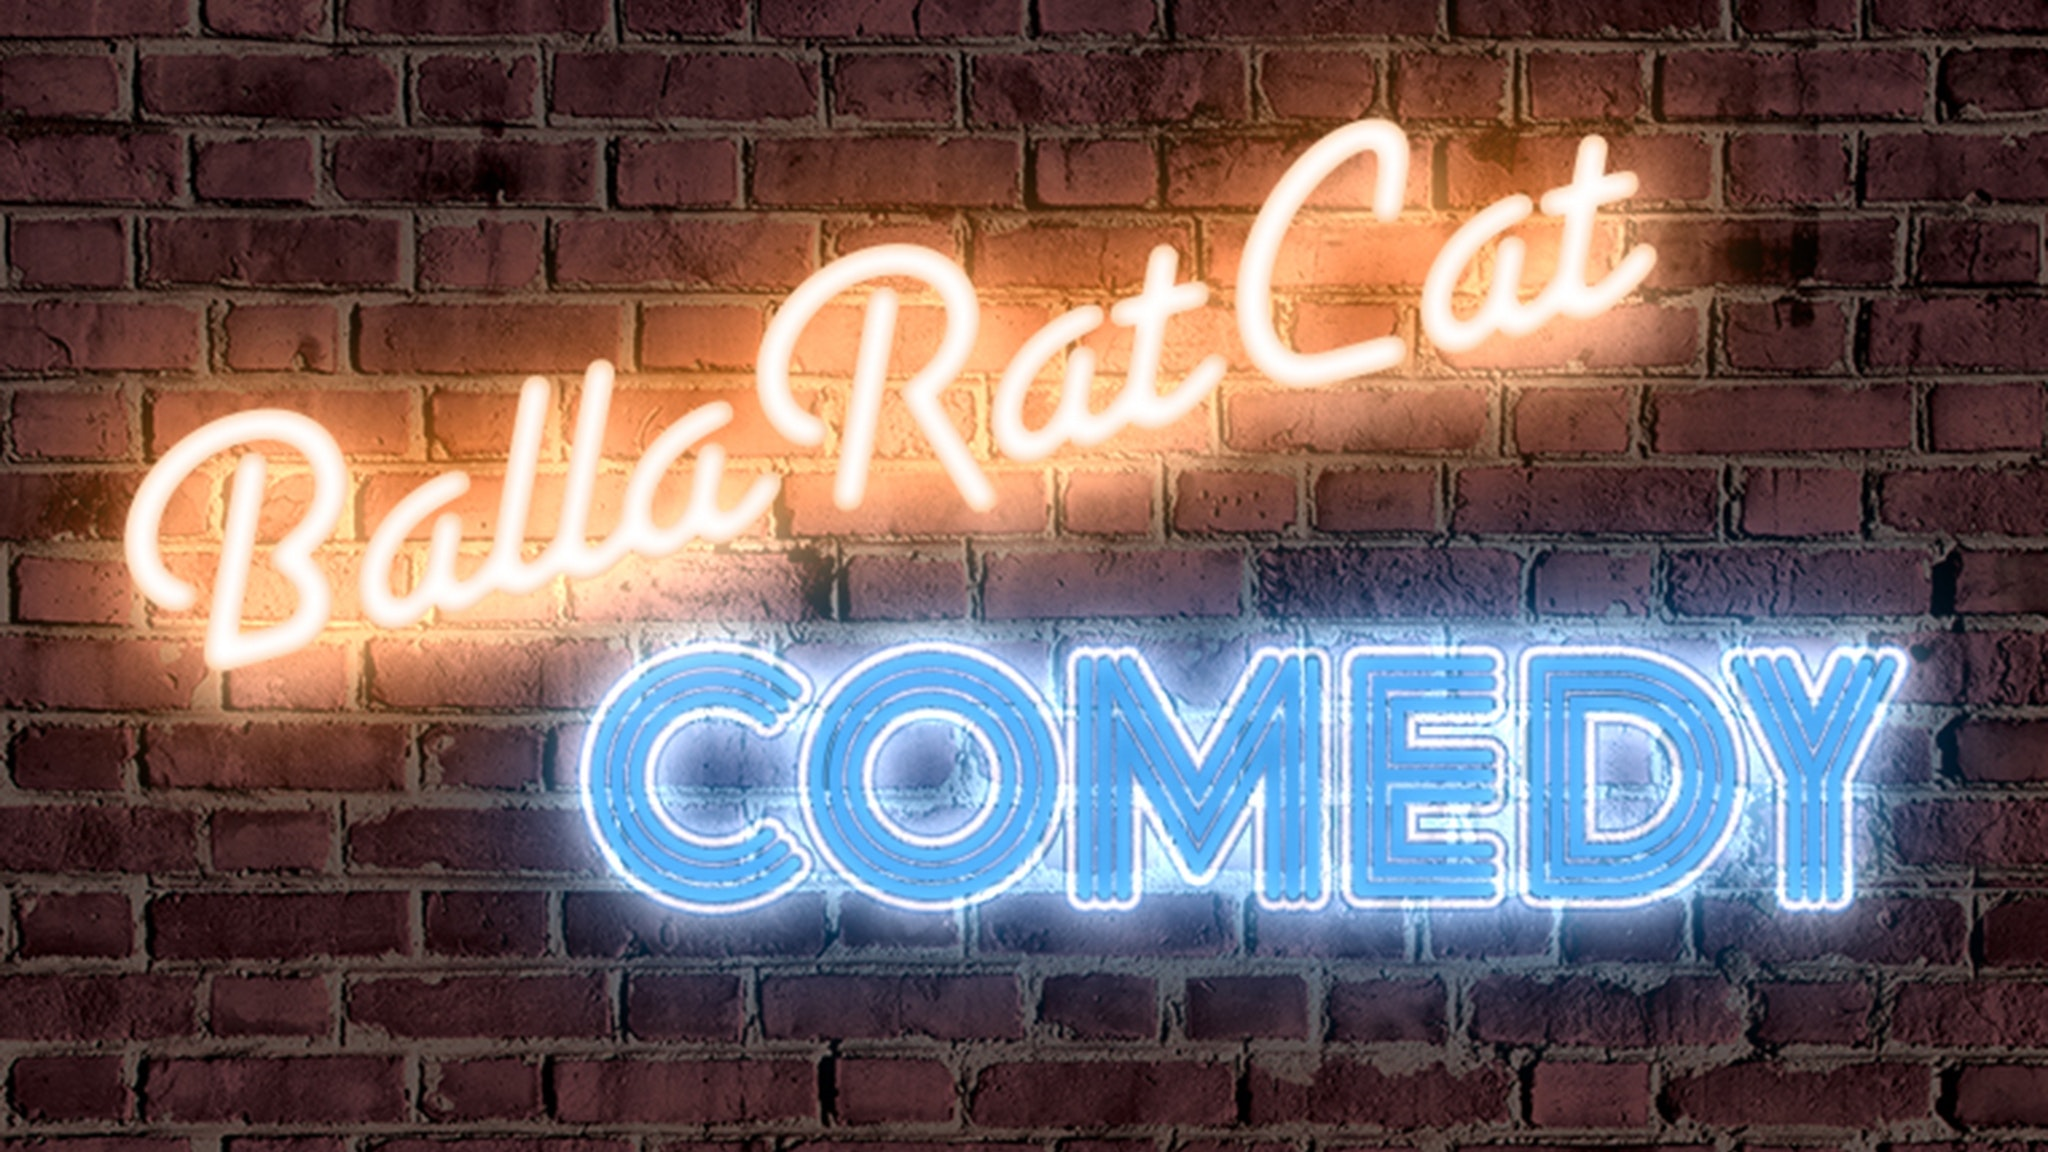 BallaRatCat Comedy Logo